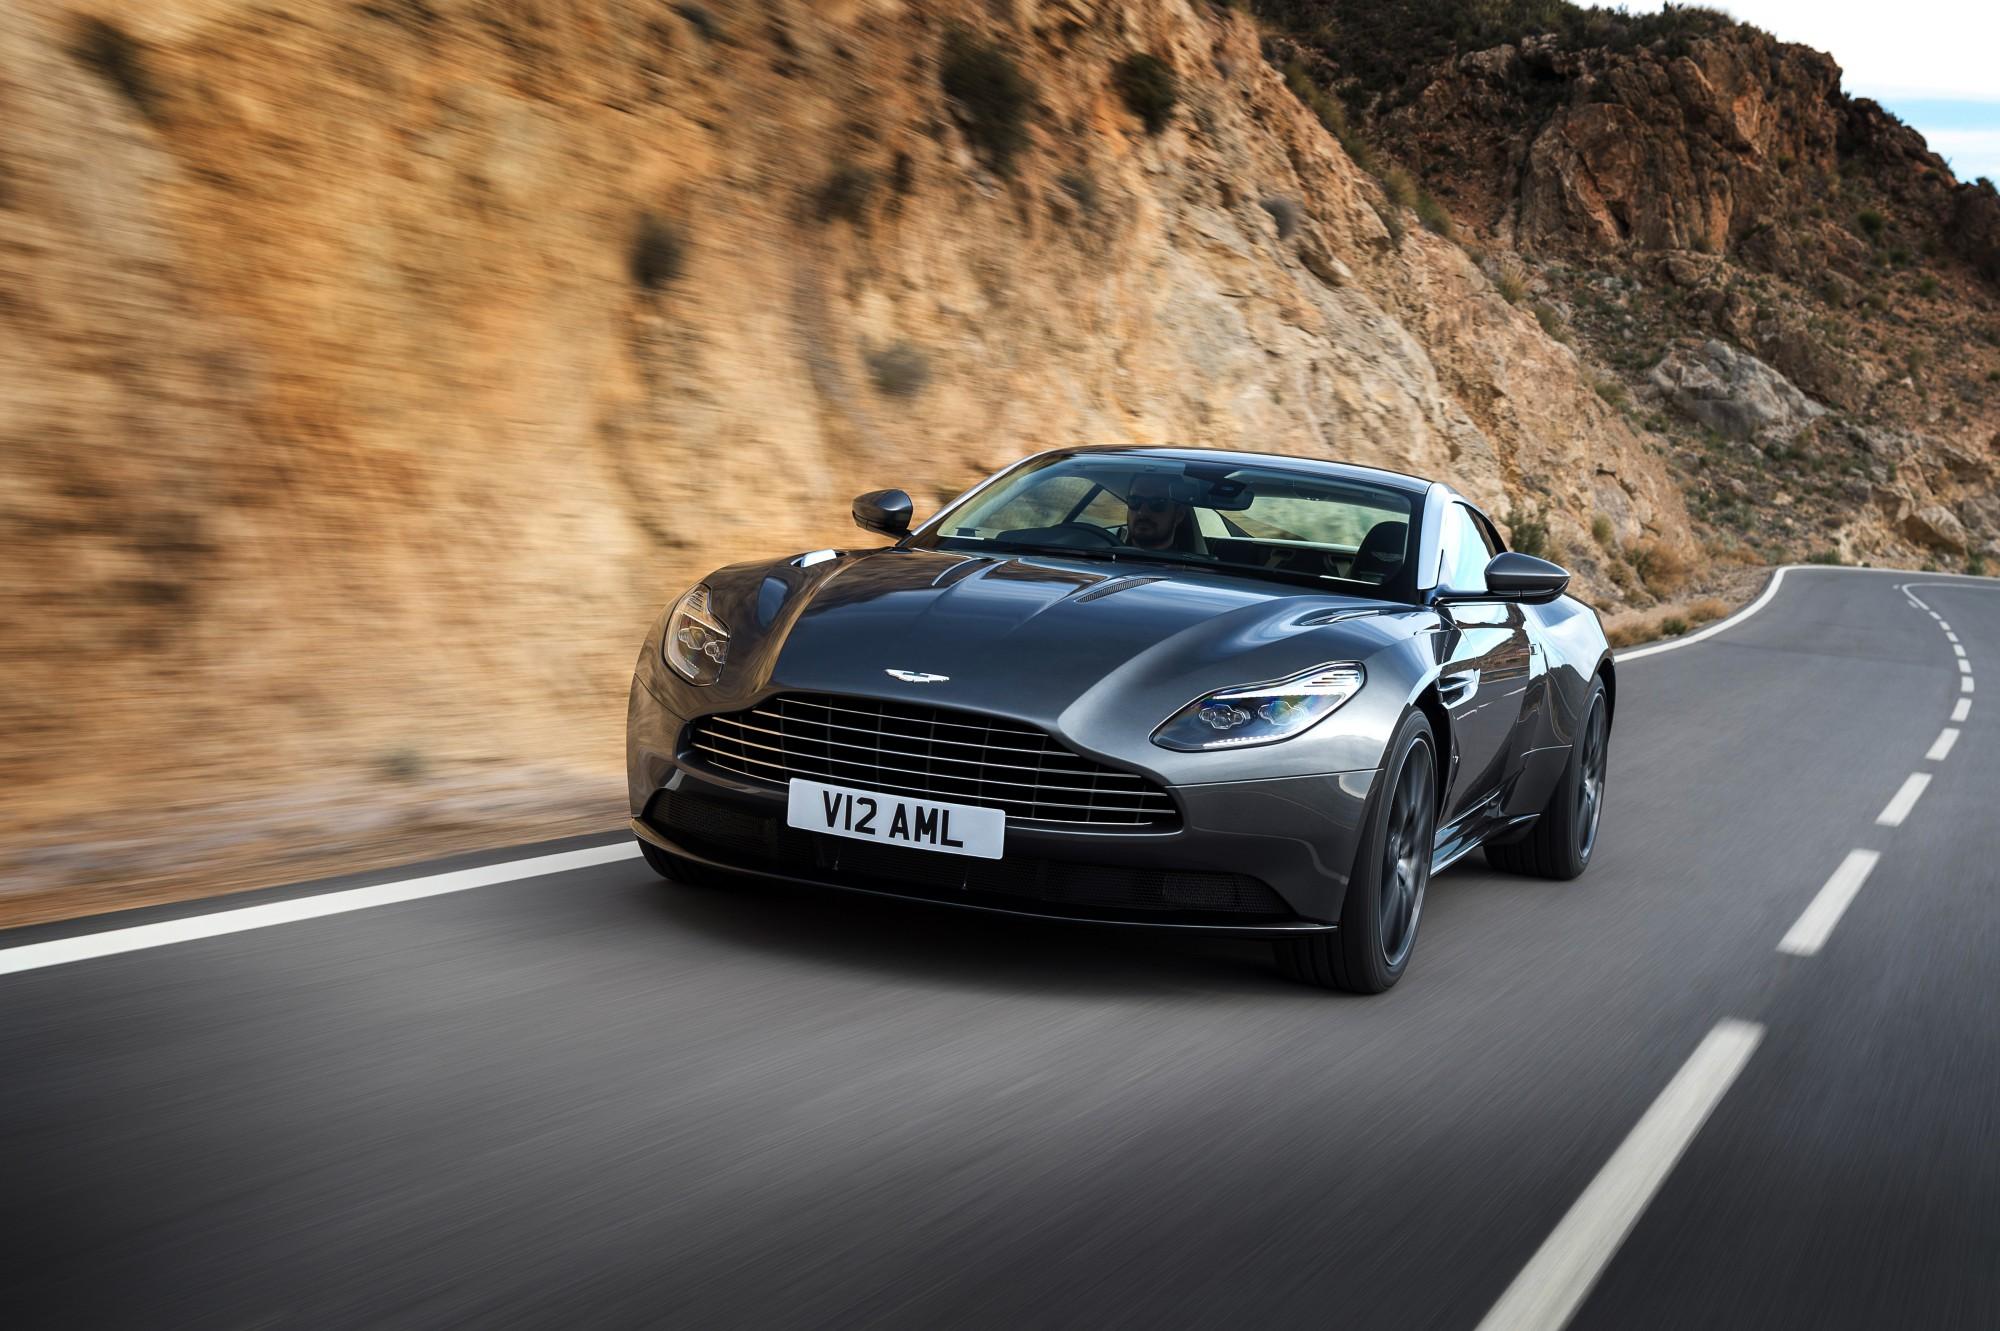 Aston Martin DB11_Embargo 010316 1400CET_16